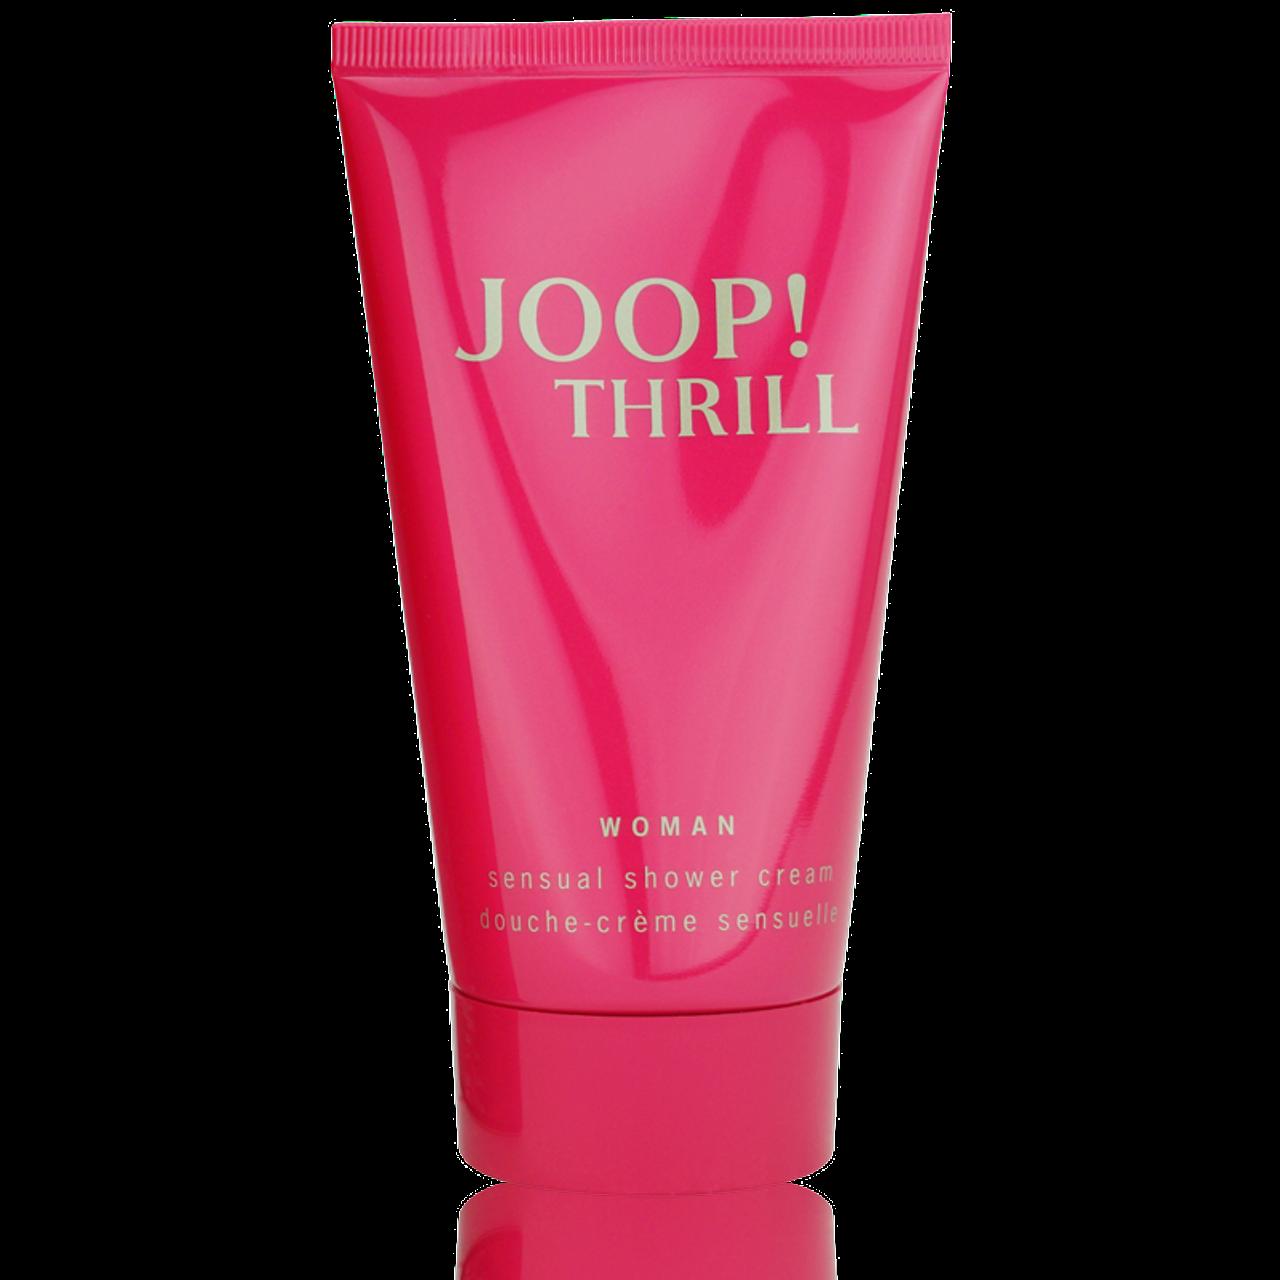 Joop Thrill Woman Shower Gel 150ml